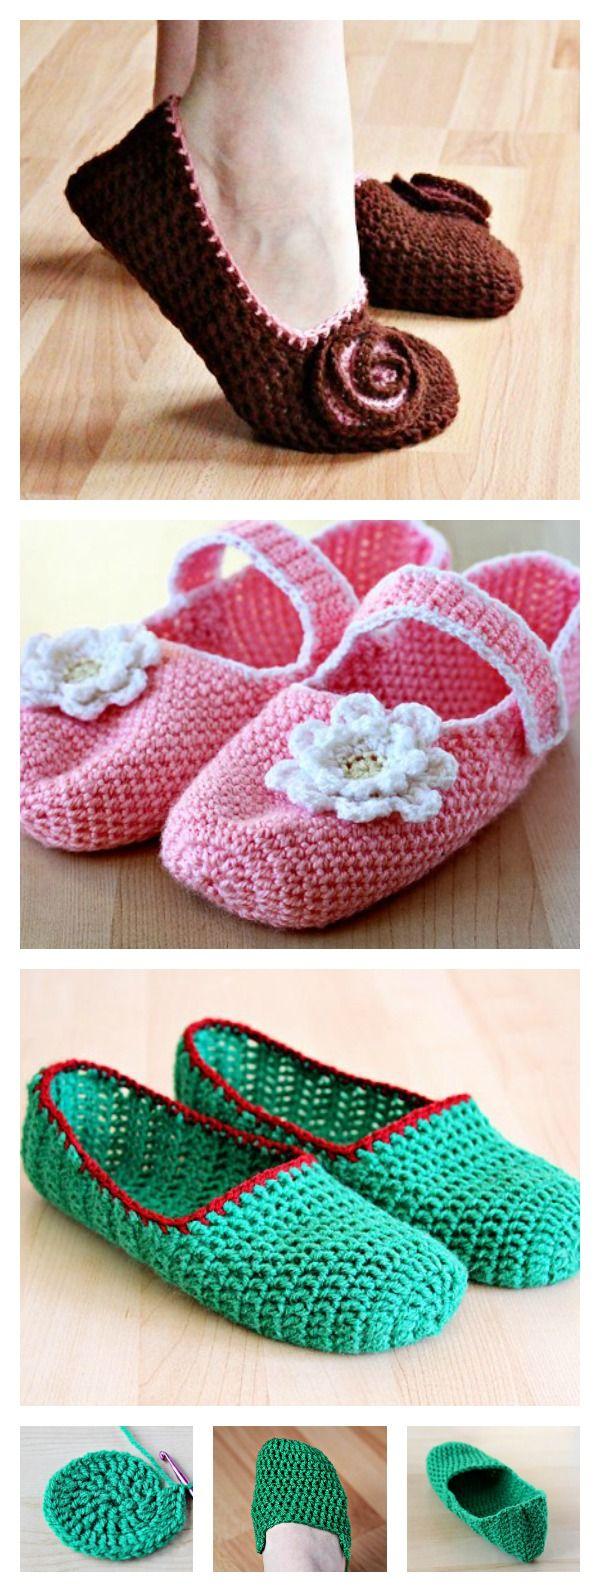 219 best crochet projects slipper n shoes boot cuffs images on simple crochet slippers free pattern bankloansurffo Gallery